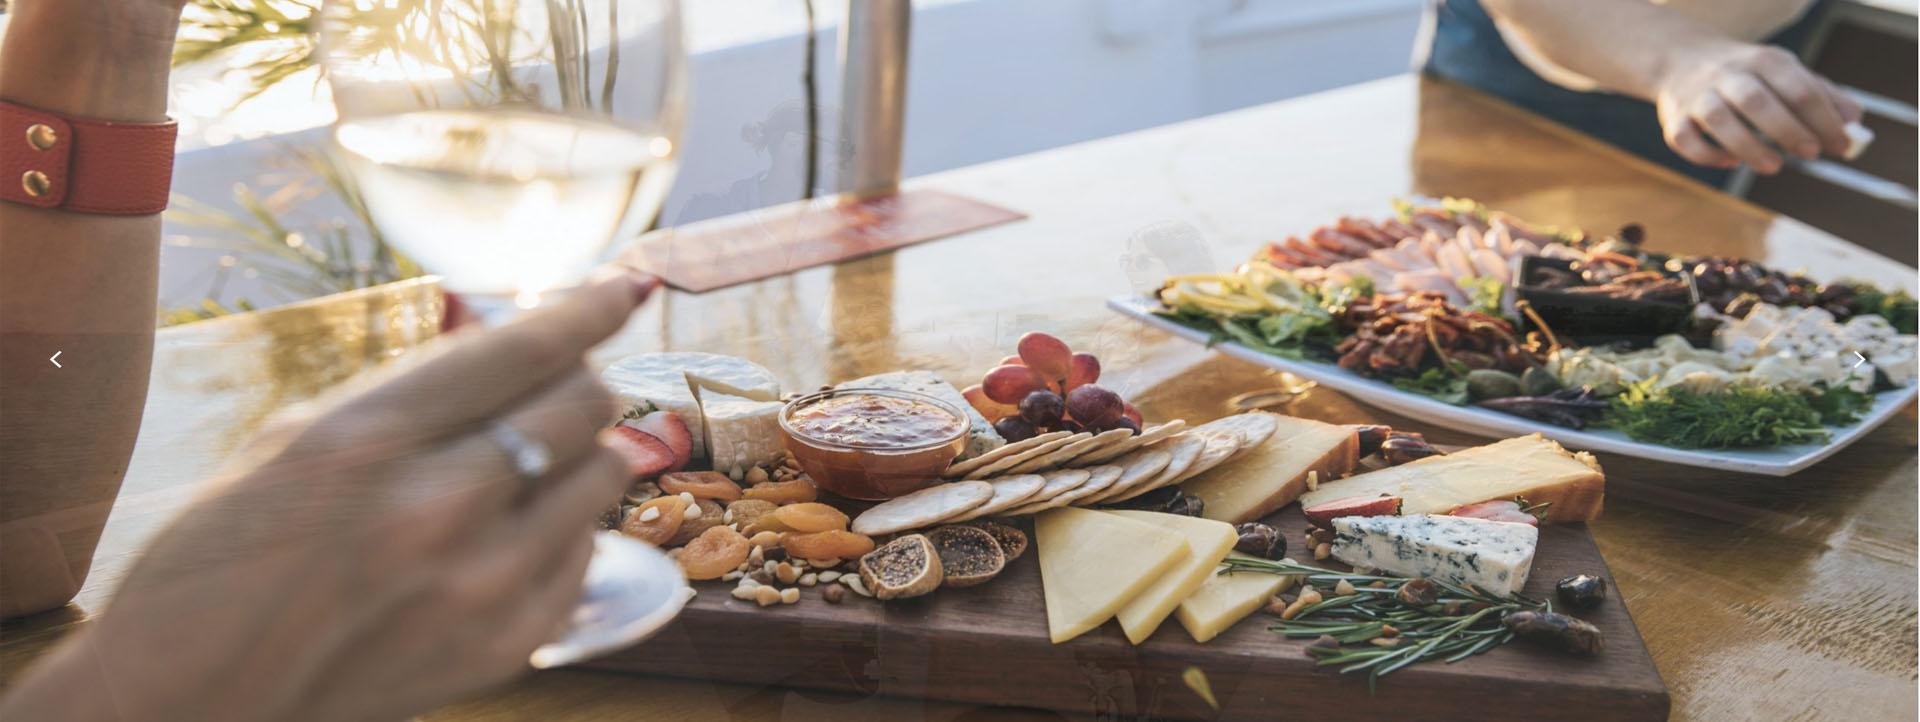 DARWIN HARBOUR Sunset cruise food board